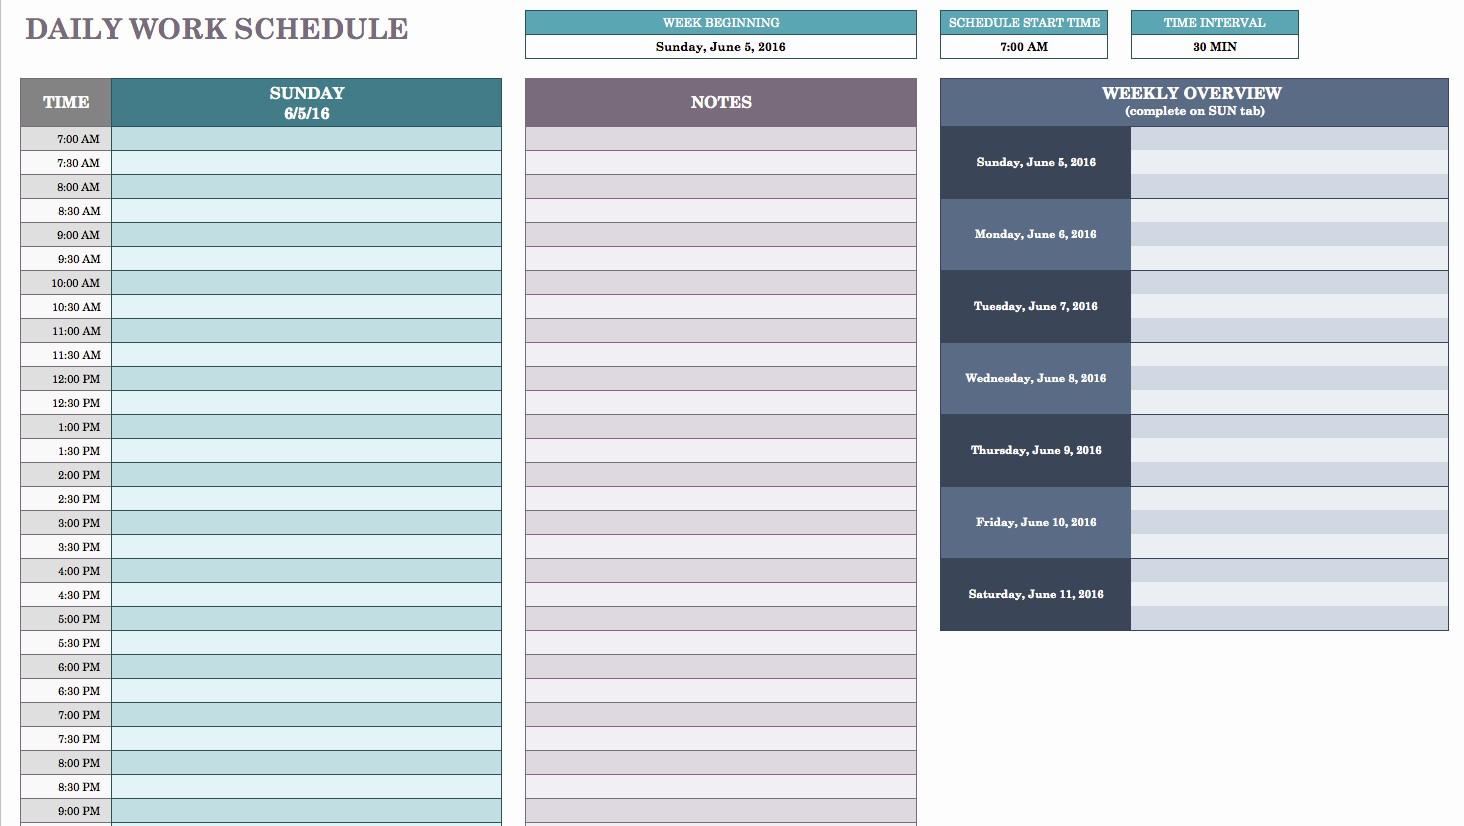 Free Weekly Work Schedule Template Elegant Free Daily Schedule Templates for Excel Smartsheet